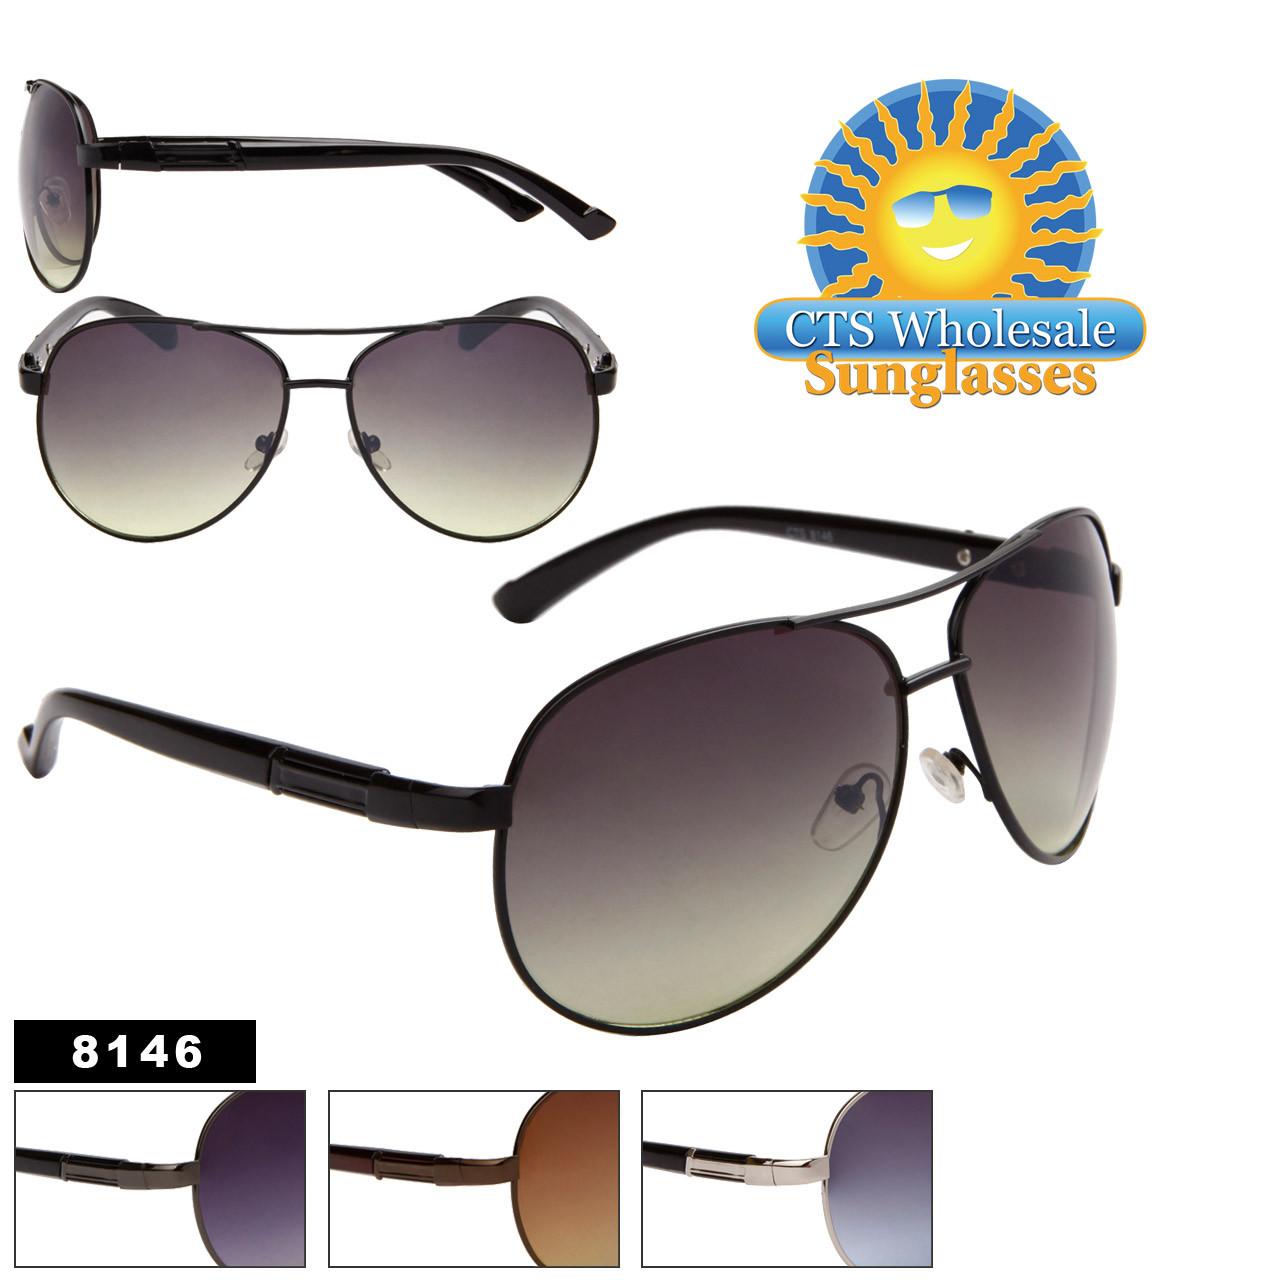 Wholesale Aviator Sunglasses - 8146